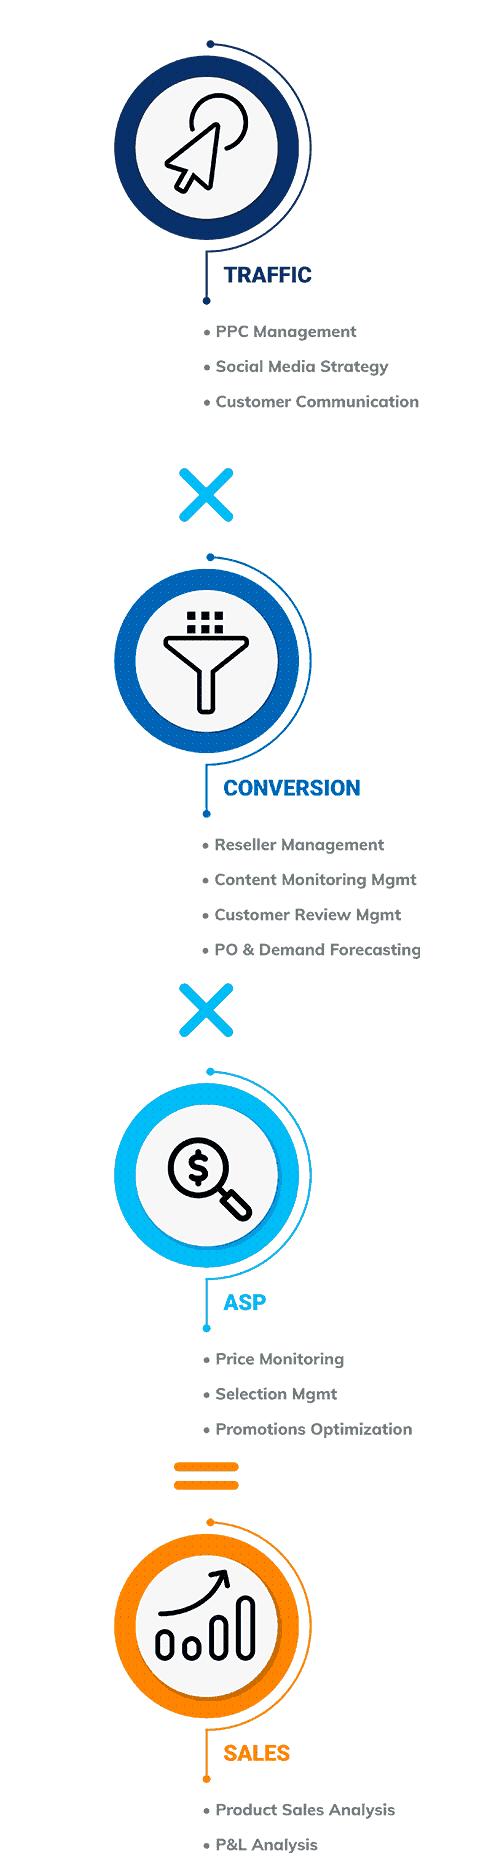 The ecommerce sales equation: Traffic x conversion x ASP $ = Sales